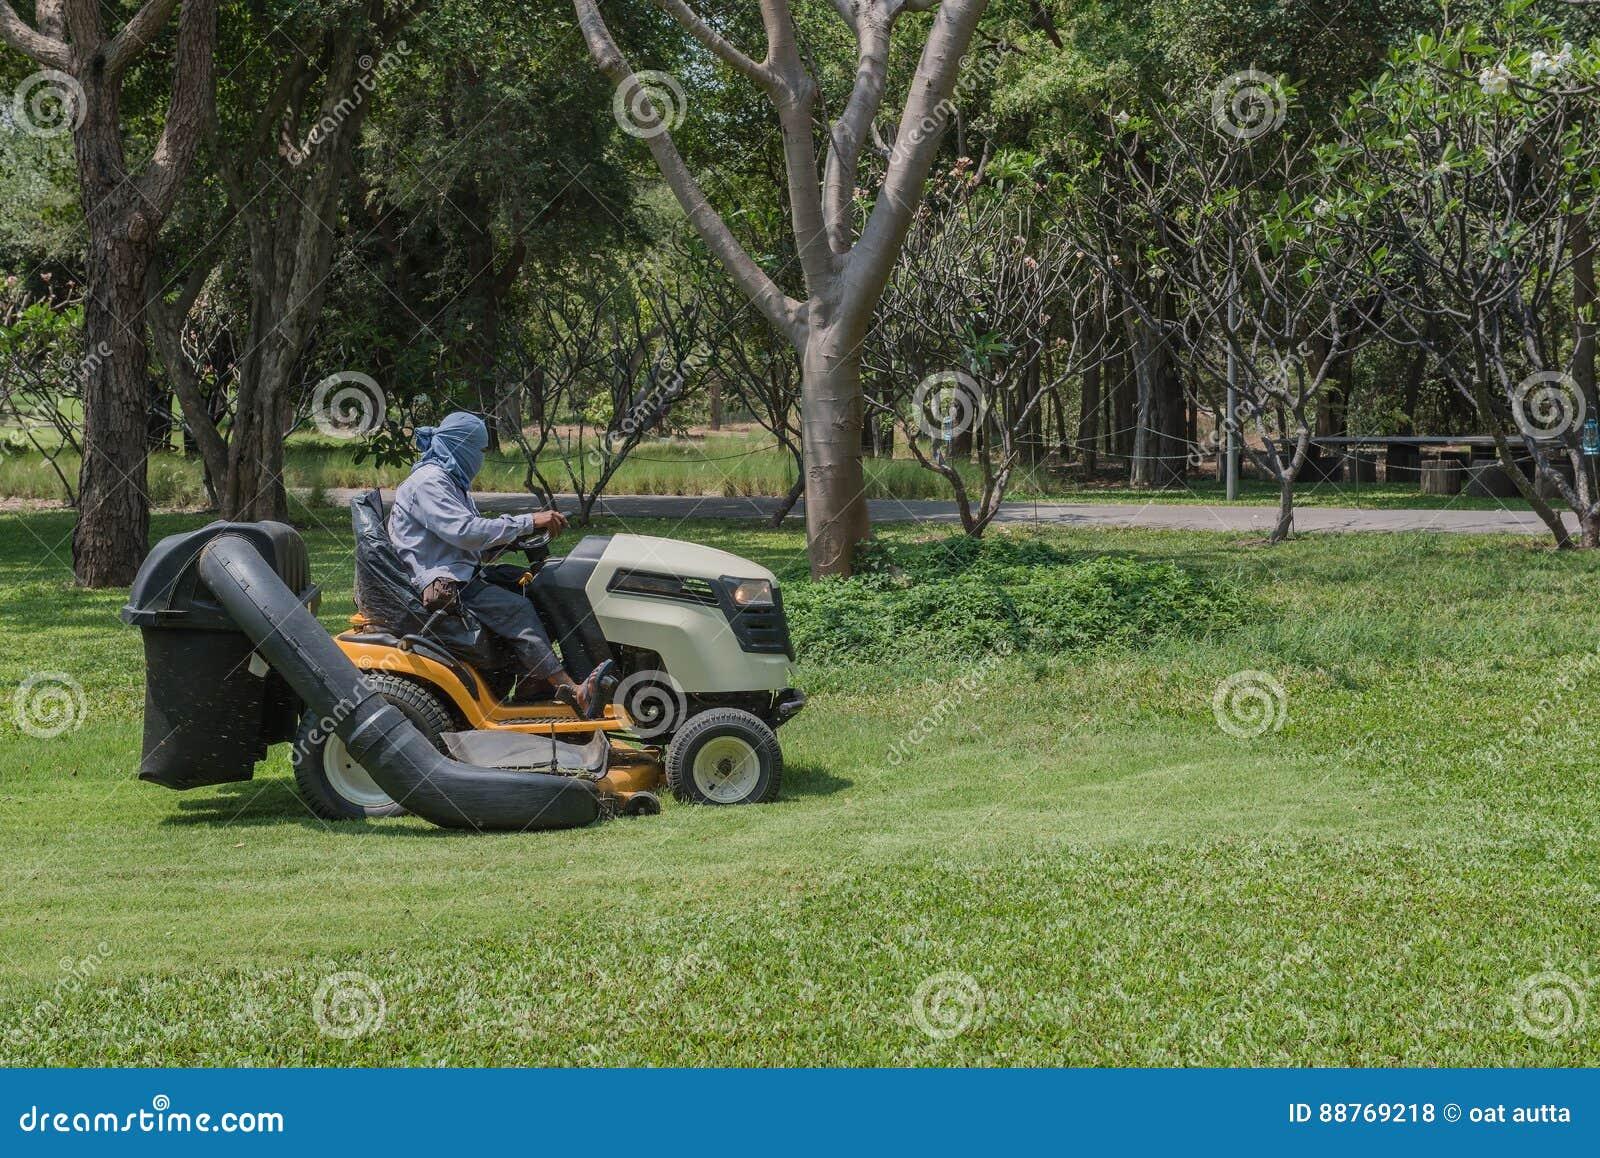 Lawn mower worker cutting grass in green field stock for Lawn mower cutting grass